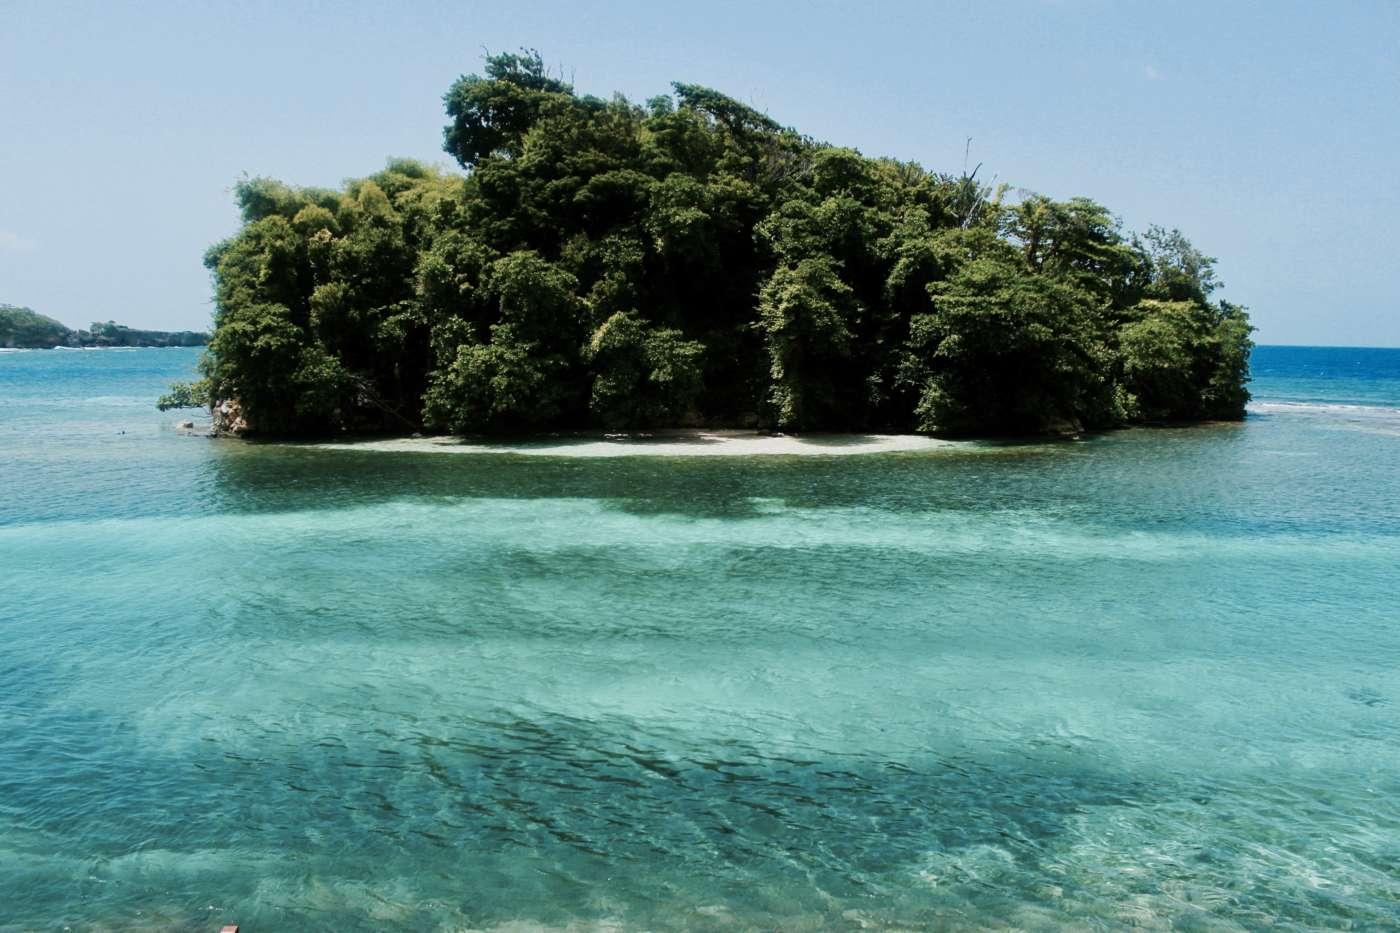 jamaica-monkey-island